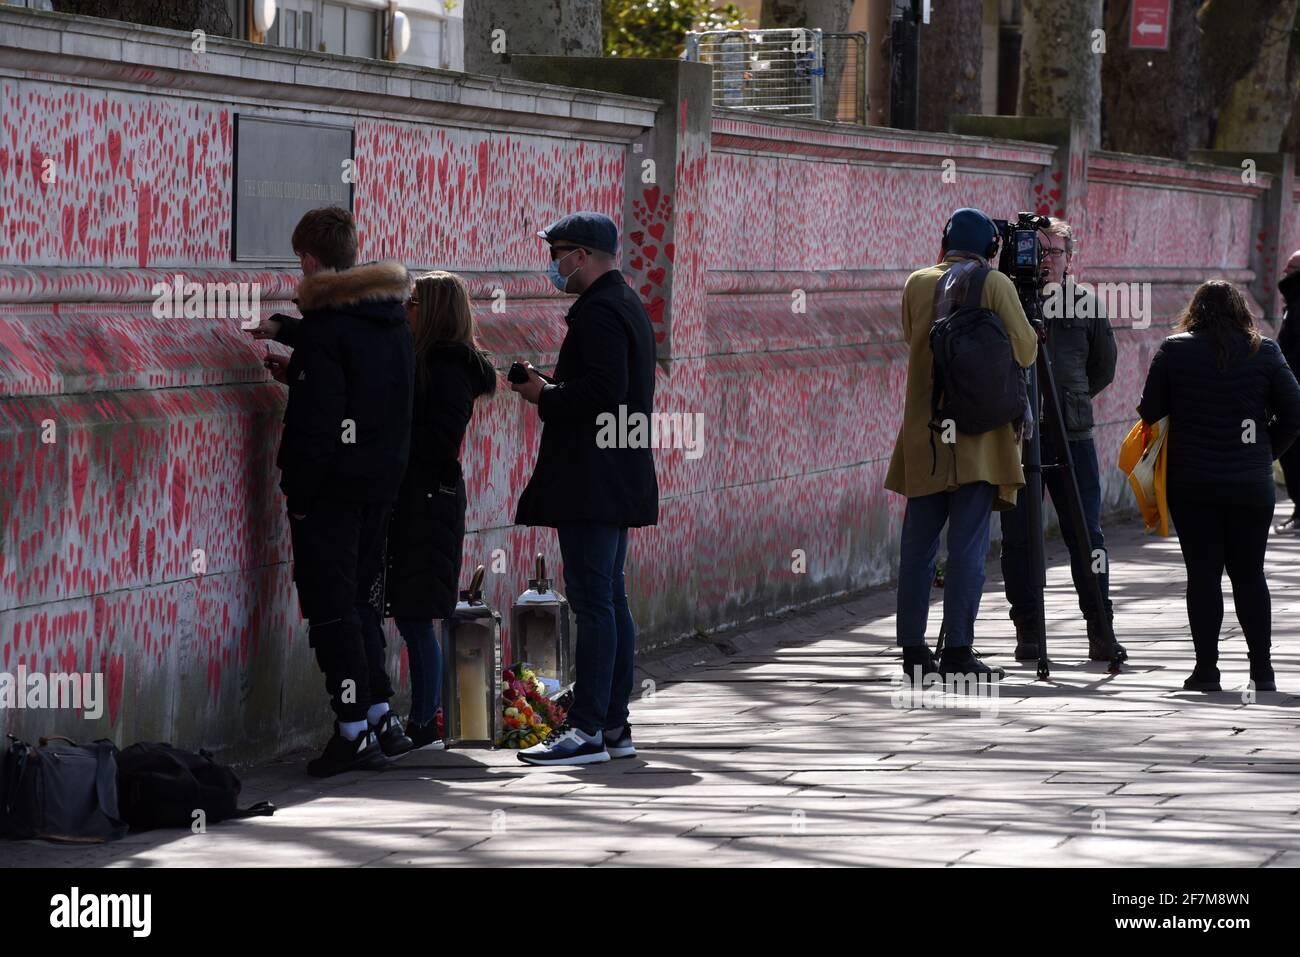 London, April 2021: Die National Covid Memorial Wall vor dem St. Thomas' Hospital auf dem Albert Embankment Path an der Themse in London Stockfoto